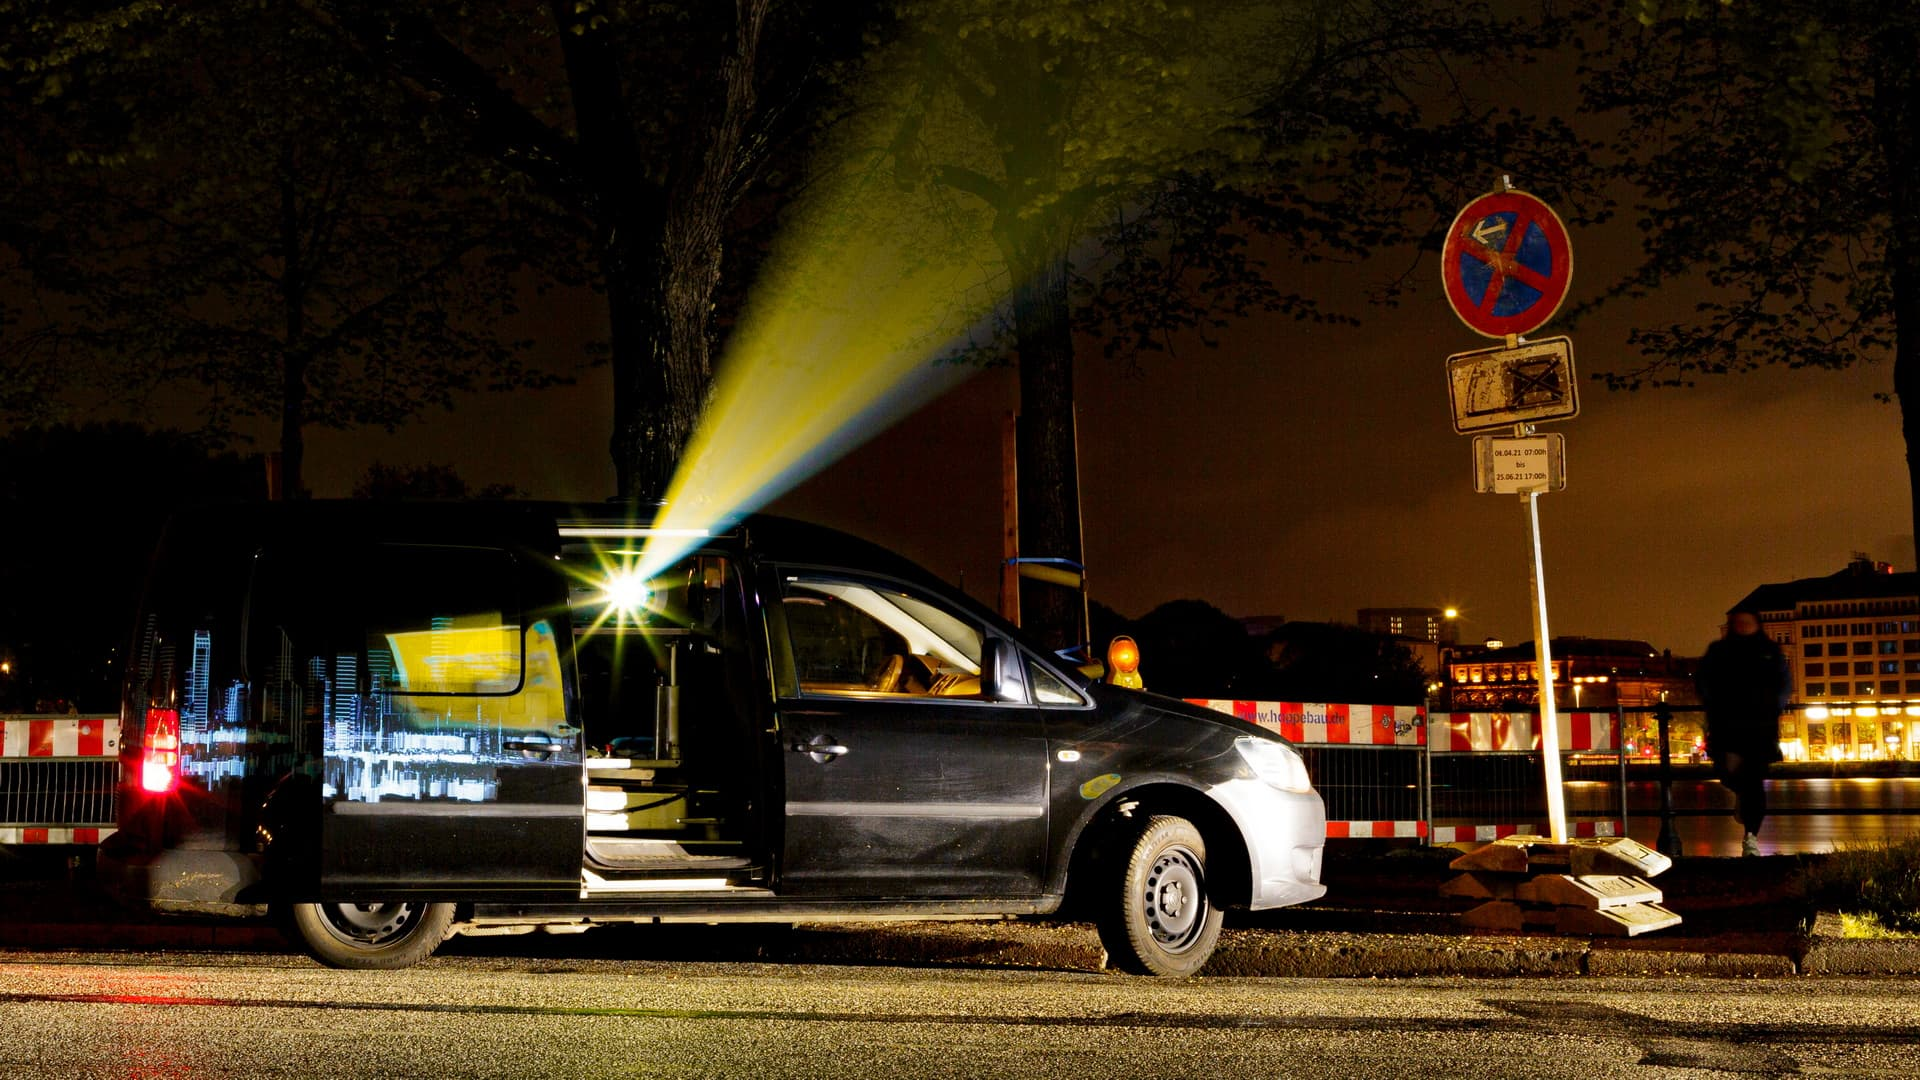 Digitales Riesenposter Udo Lindenberg Projektionsfahrzeug 2